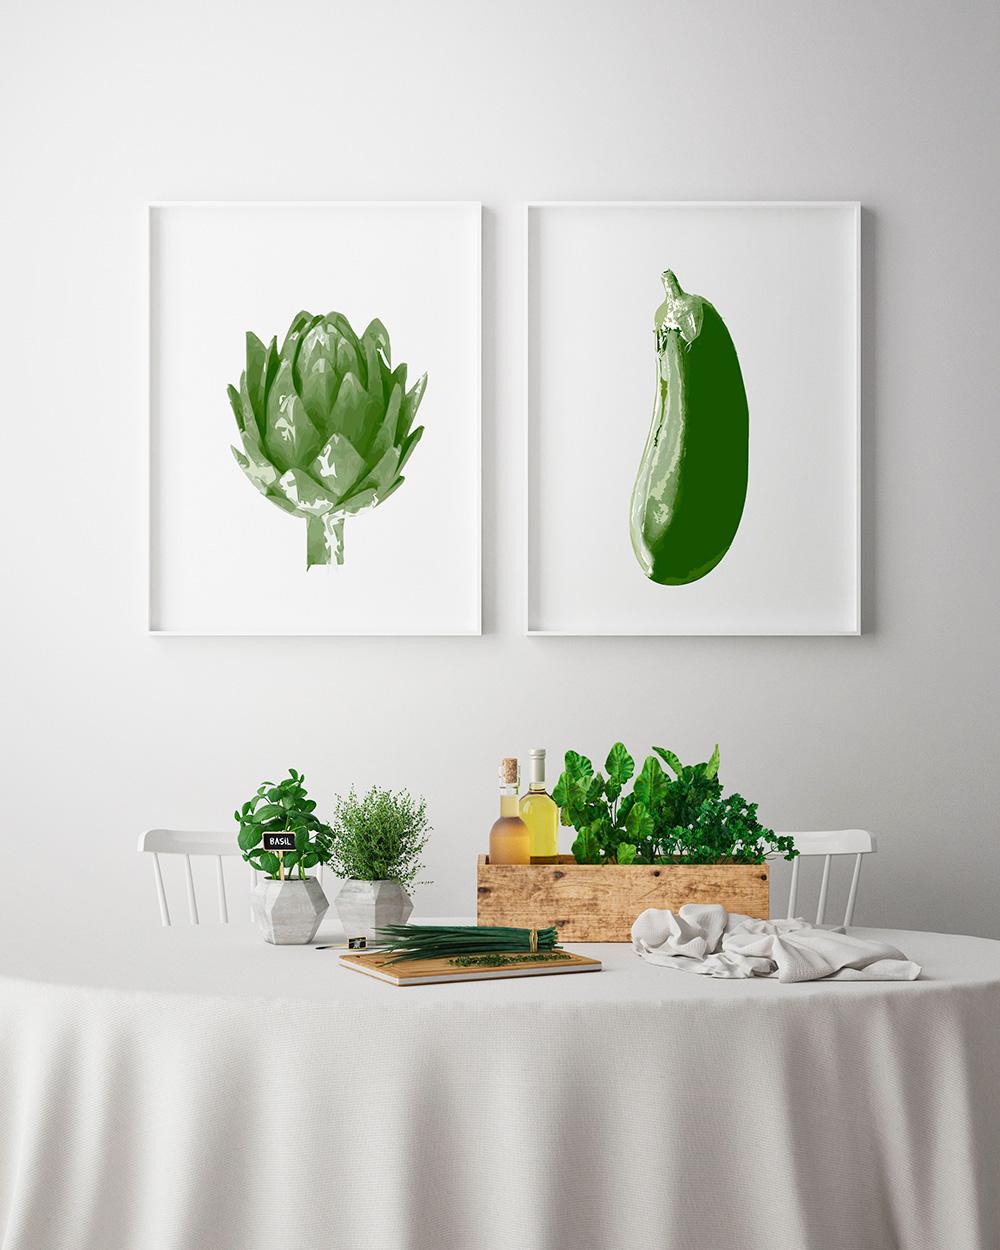 2-comedor-hortalizas-verdes.jpg